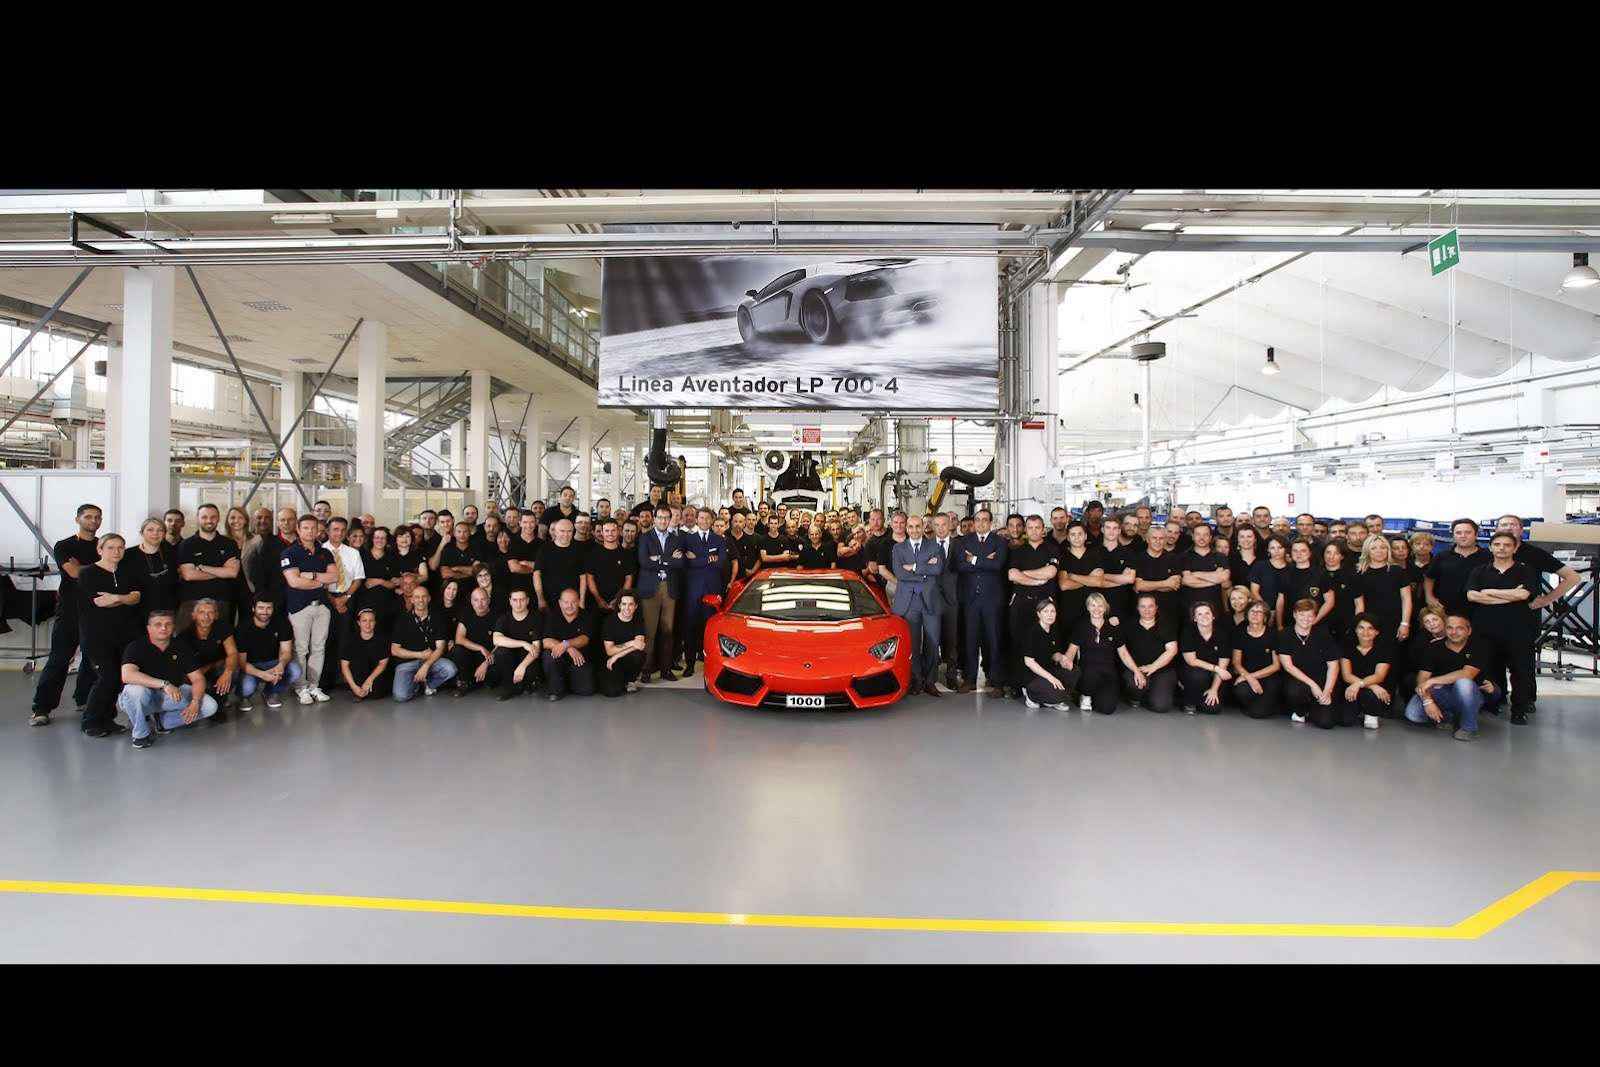 Lamborghini Aventador LP700-4 1000 egzemplarz